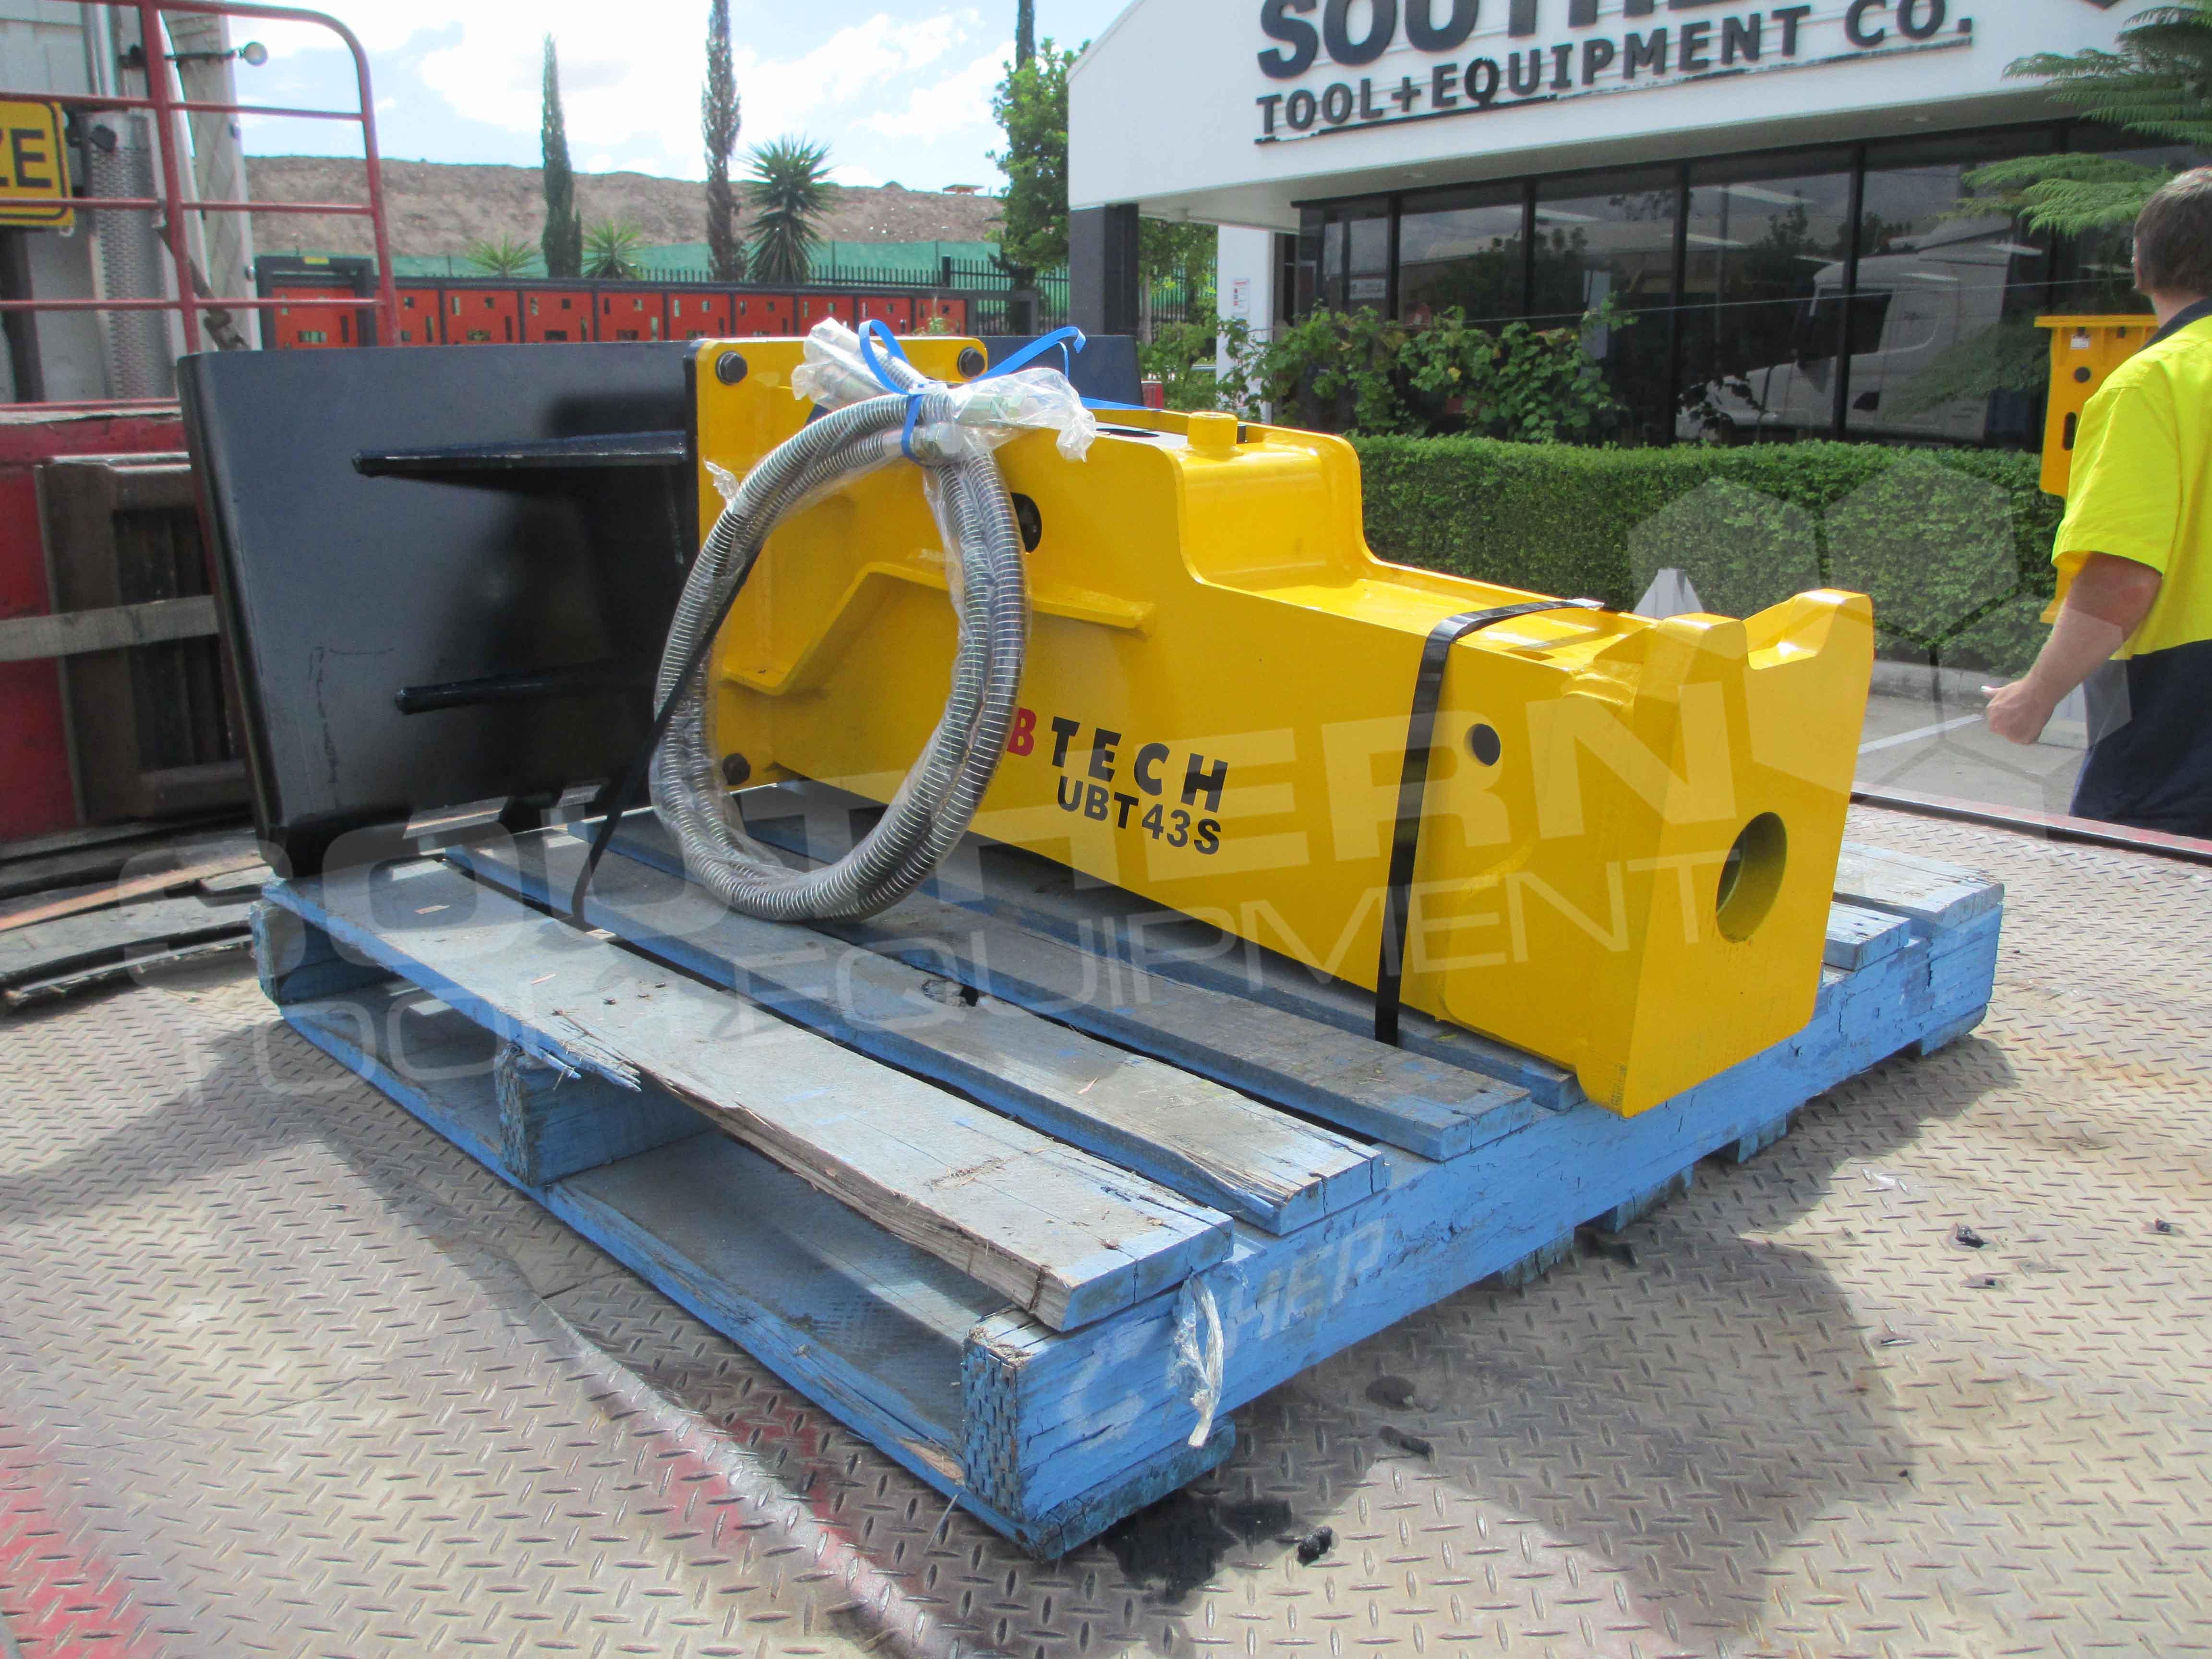 UBTECH UBT43S Skid Steer Loader Hydraulic Rock Breaker